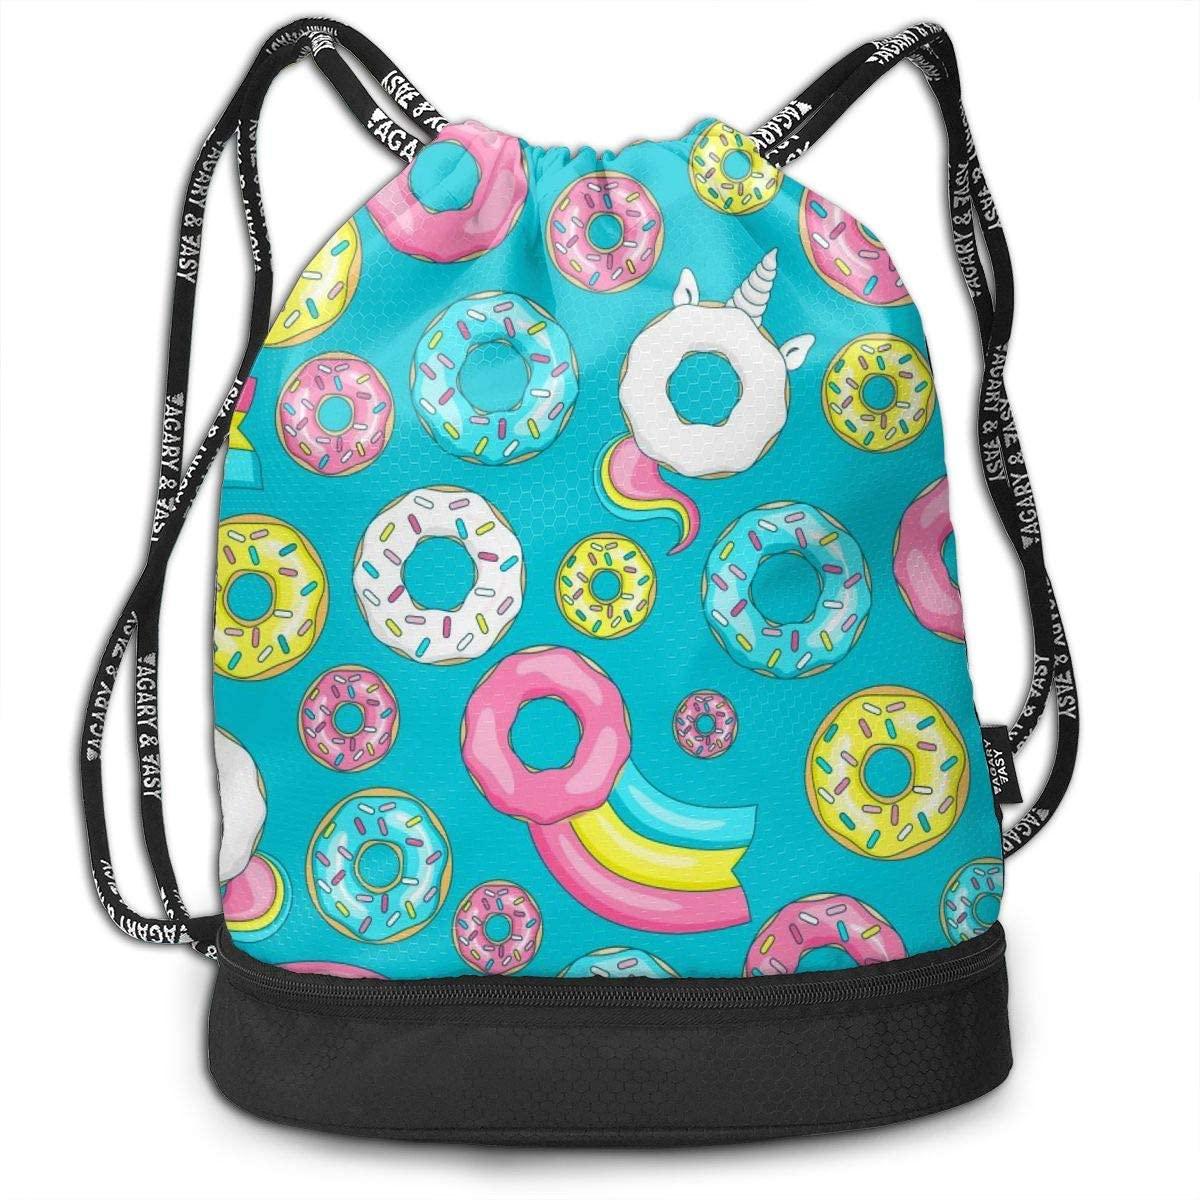 Bundle Backpacks Donut Unicorn with White Glaze Gym Sack Drawstring Bags Casual Daypack Yoga Bag School Training Pouch